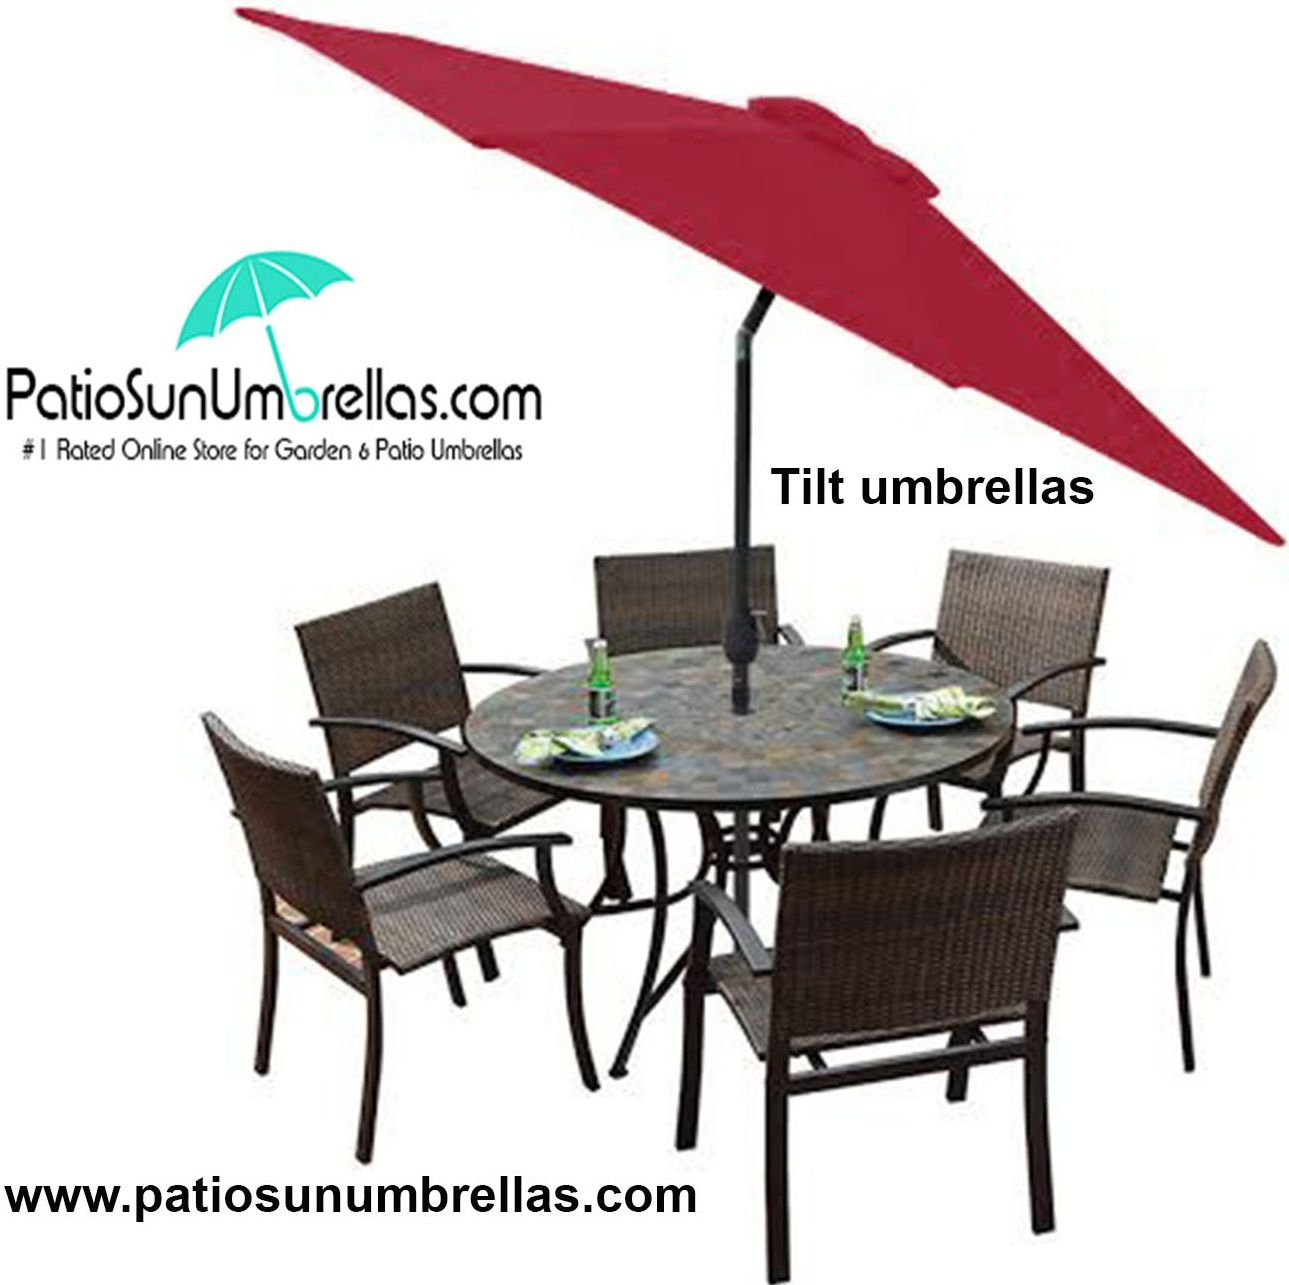 Buy Patio Umberlla U0026 Tilt Umbrellas Online With Free Shipping And Lifetime  Warranty @ PatioSunUmbrellas.